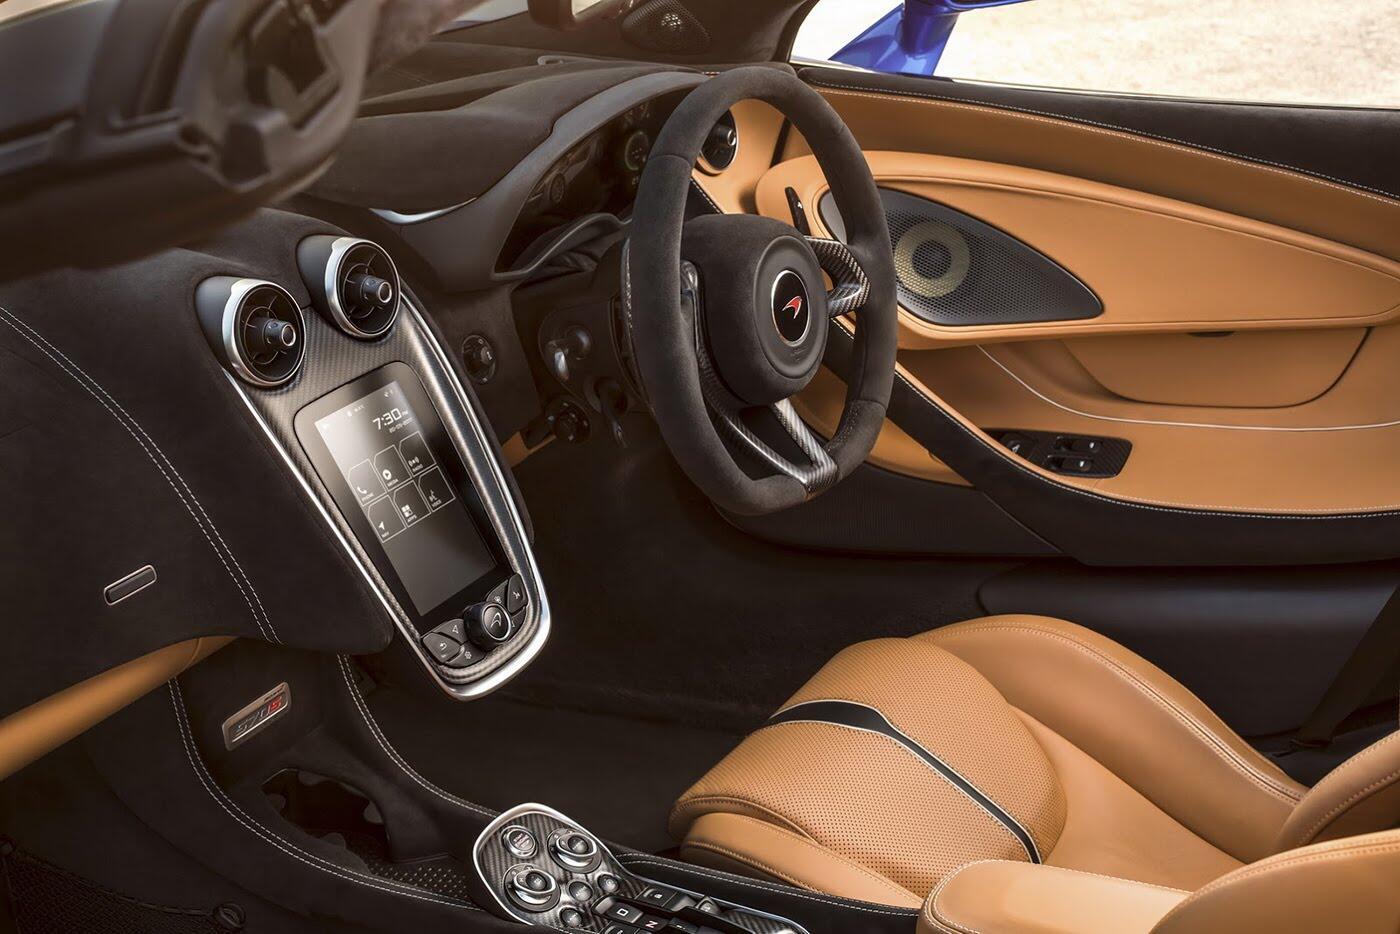 Siêu xe McLaren 570S Spider sắp ra mắt - Hình 6